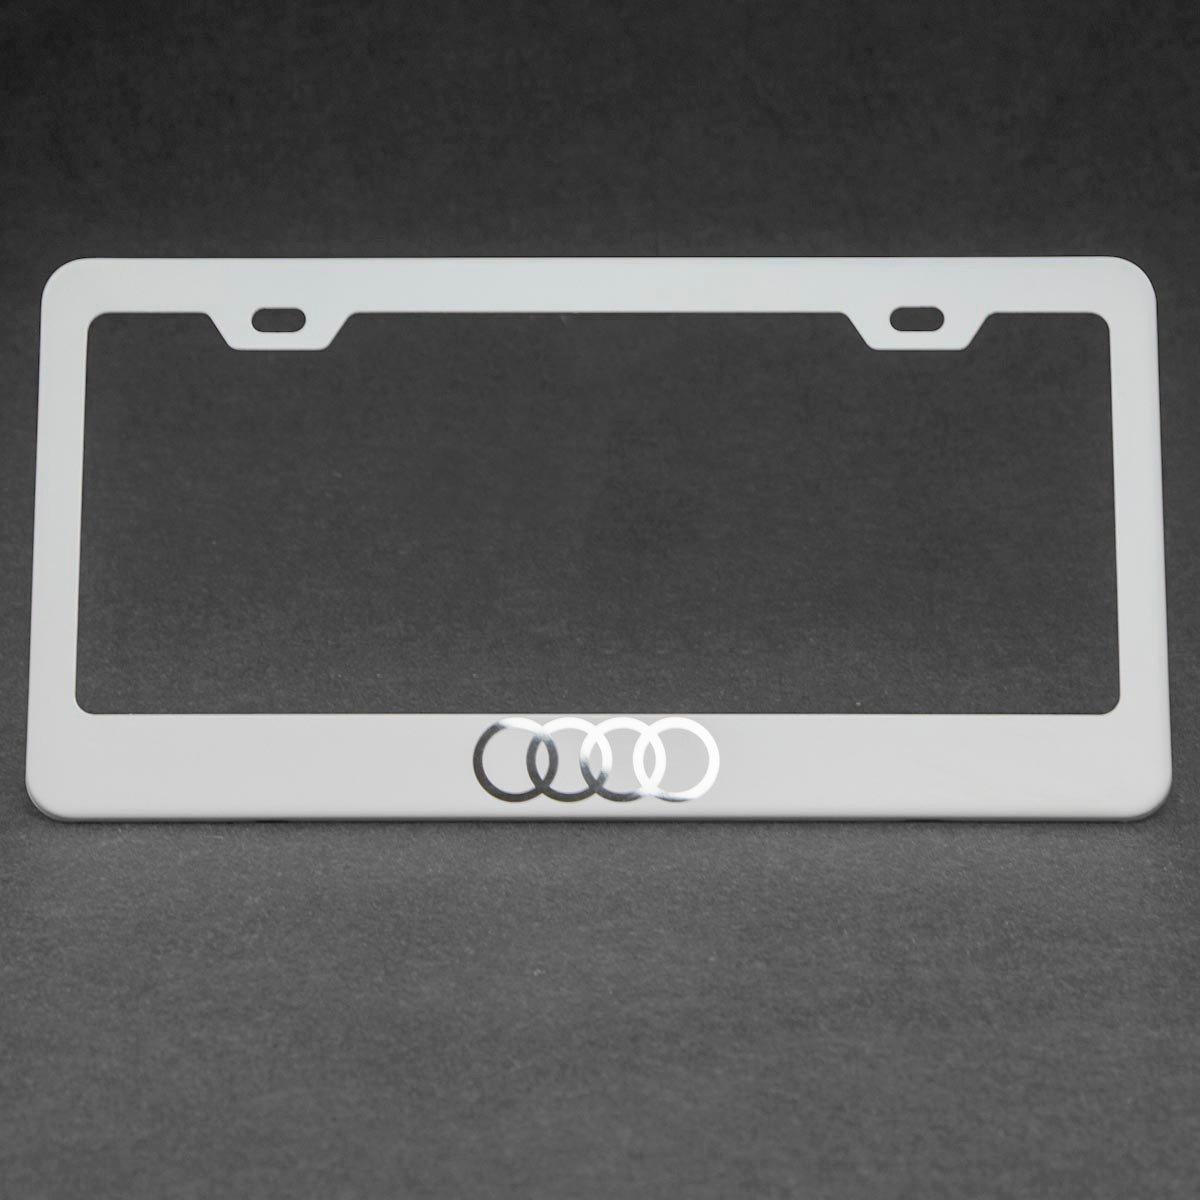 One Matte White Audi Logo Mirror Stainless Steel License Plate Frame Holder Front Or Rear Bracket